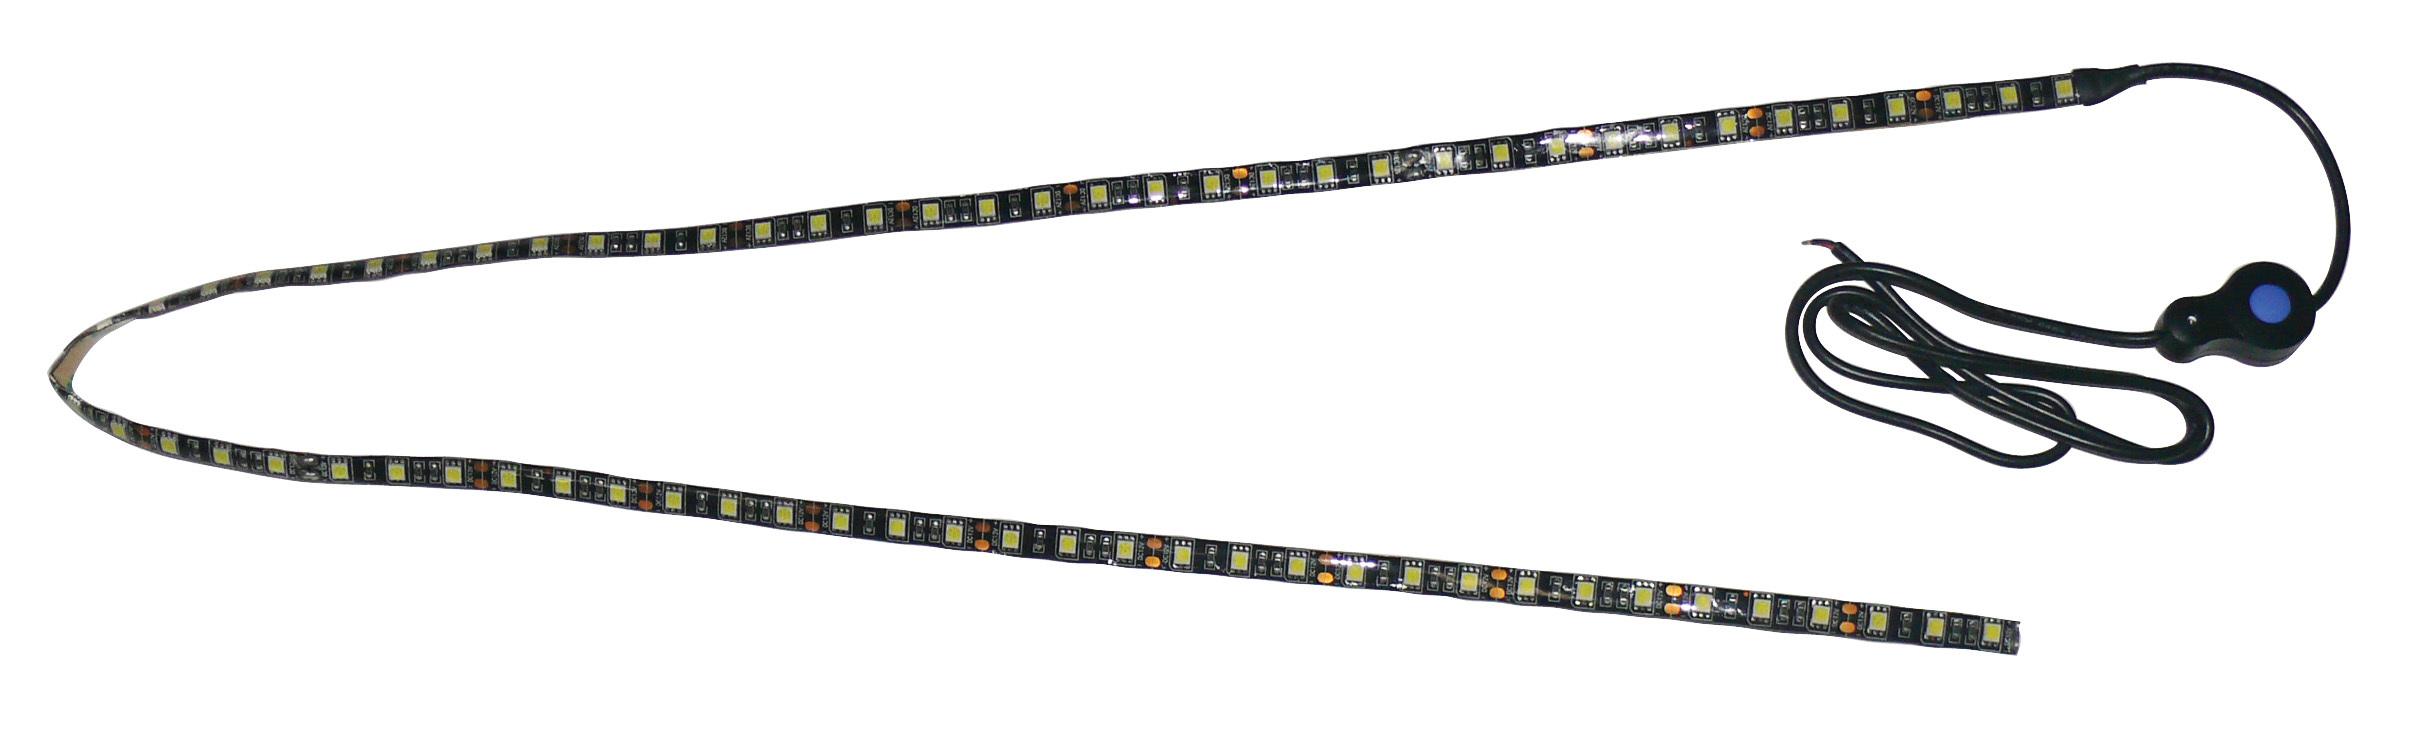 Black Backed LED Utility Strip Light - 4 Foot 52761